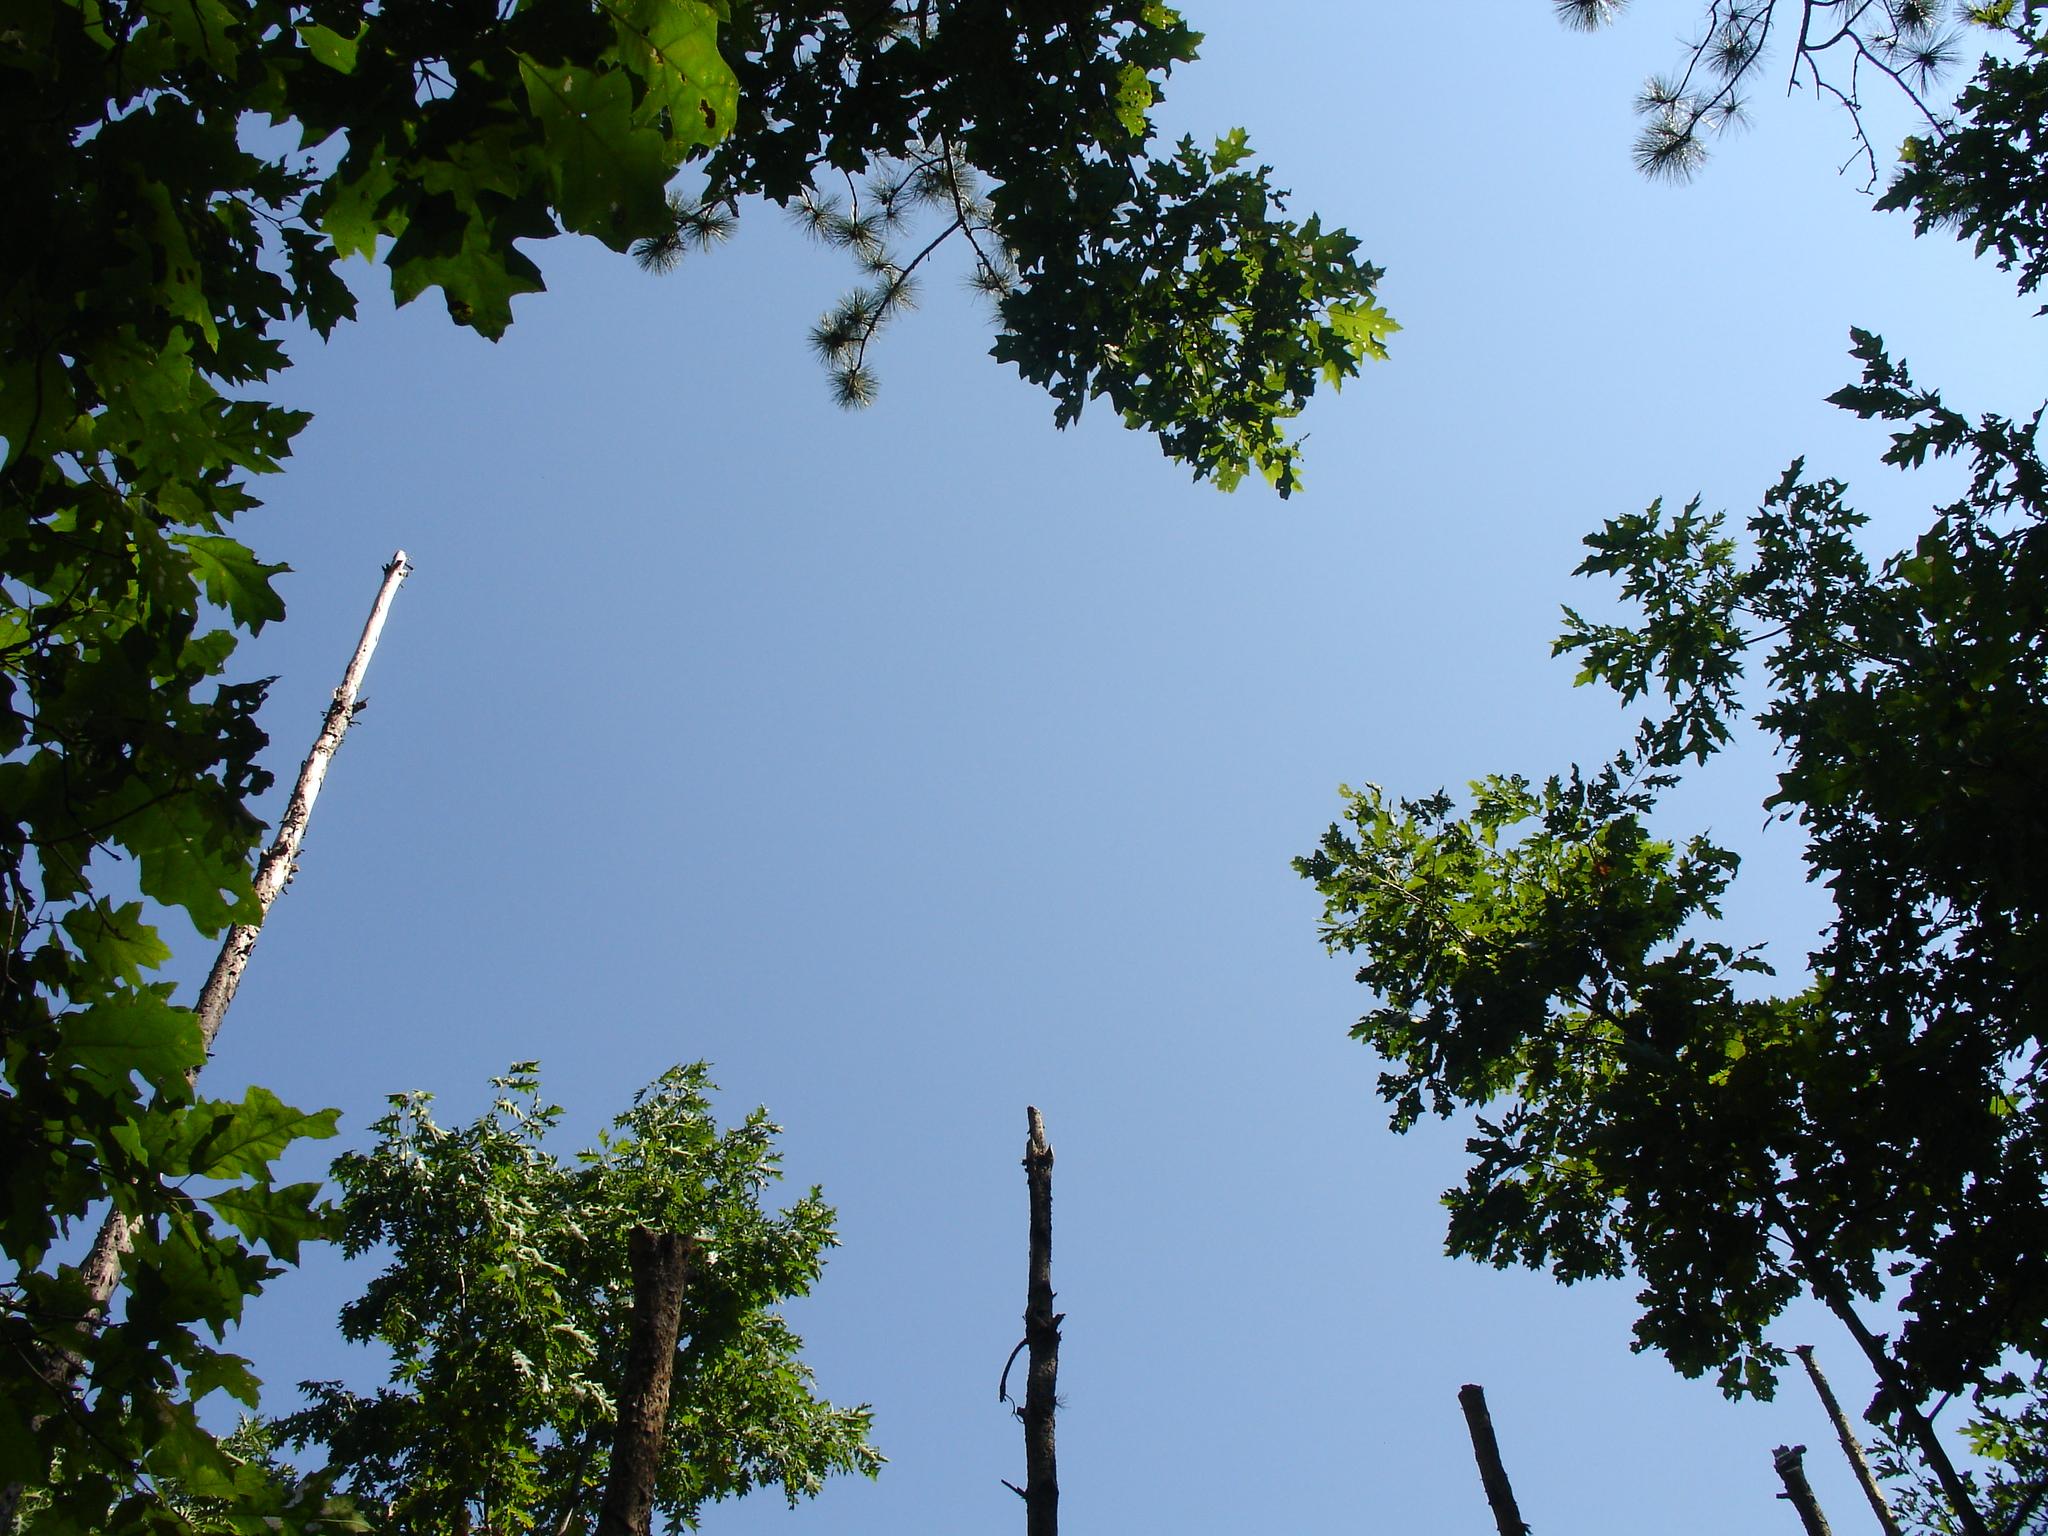 12a-Celestiall-Harp-Forest-Woodhenge-setup-283